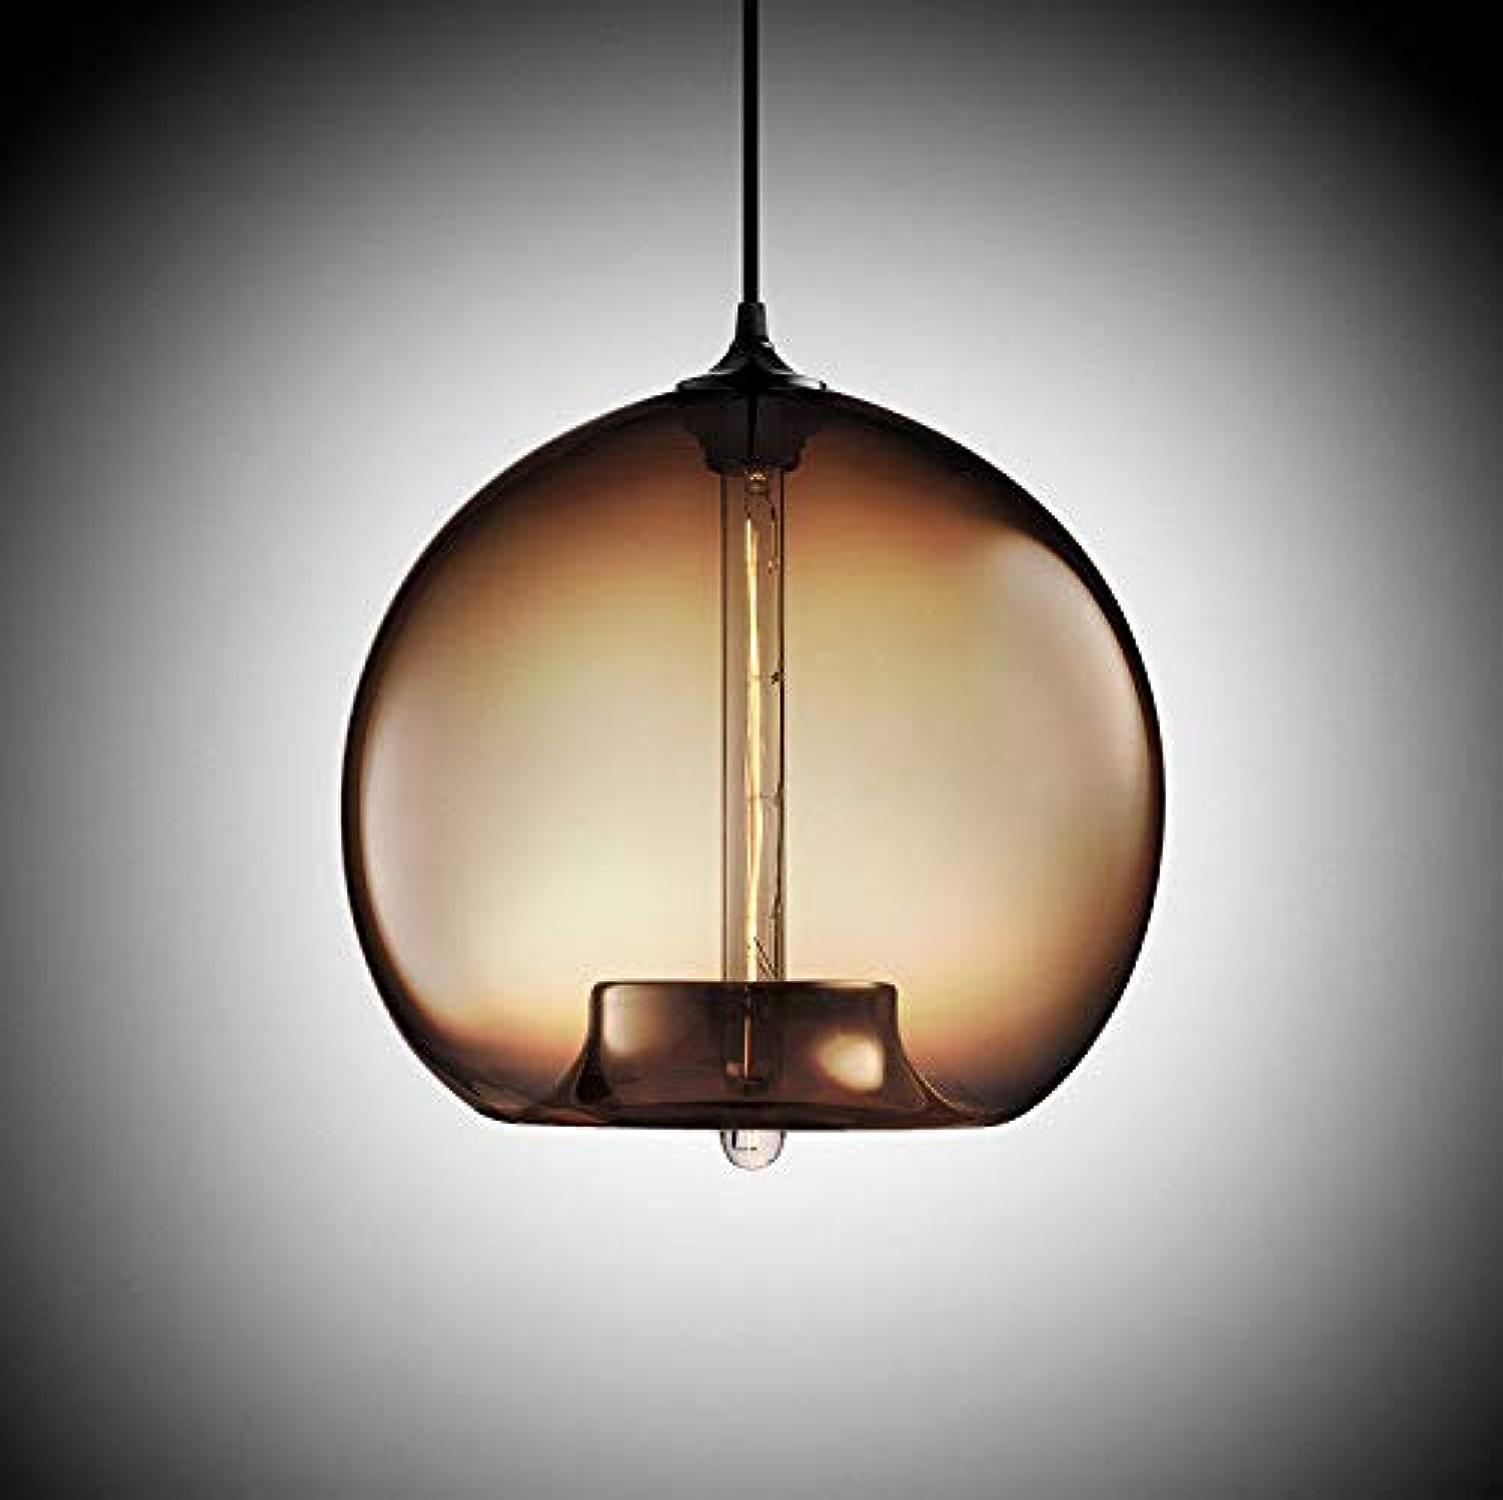 Beakjiful E27 suspension lustre en verre, 305  305 mm, 4